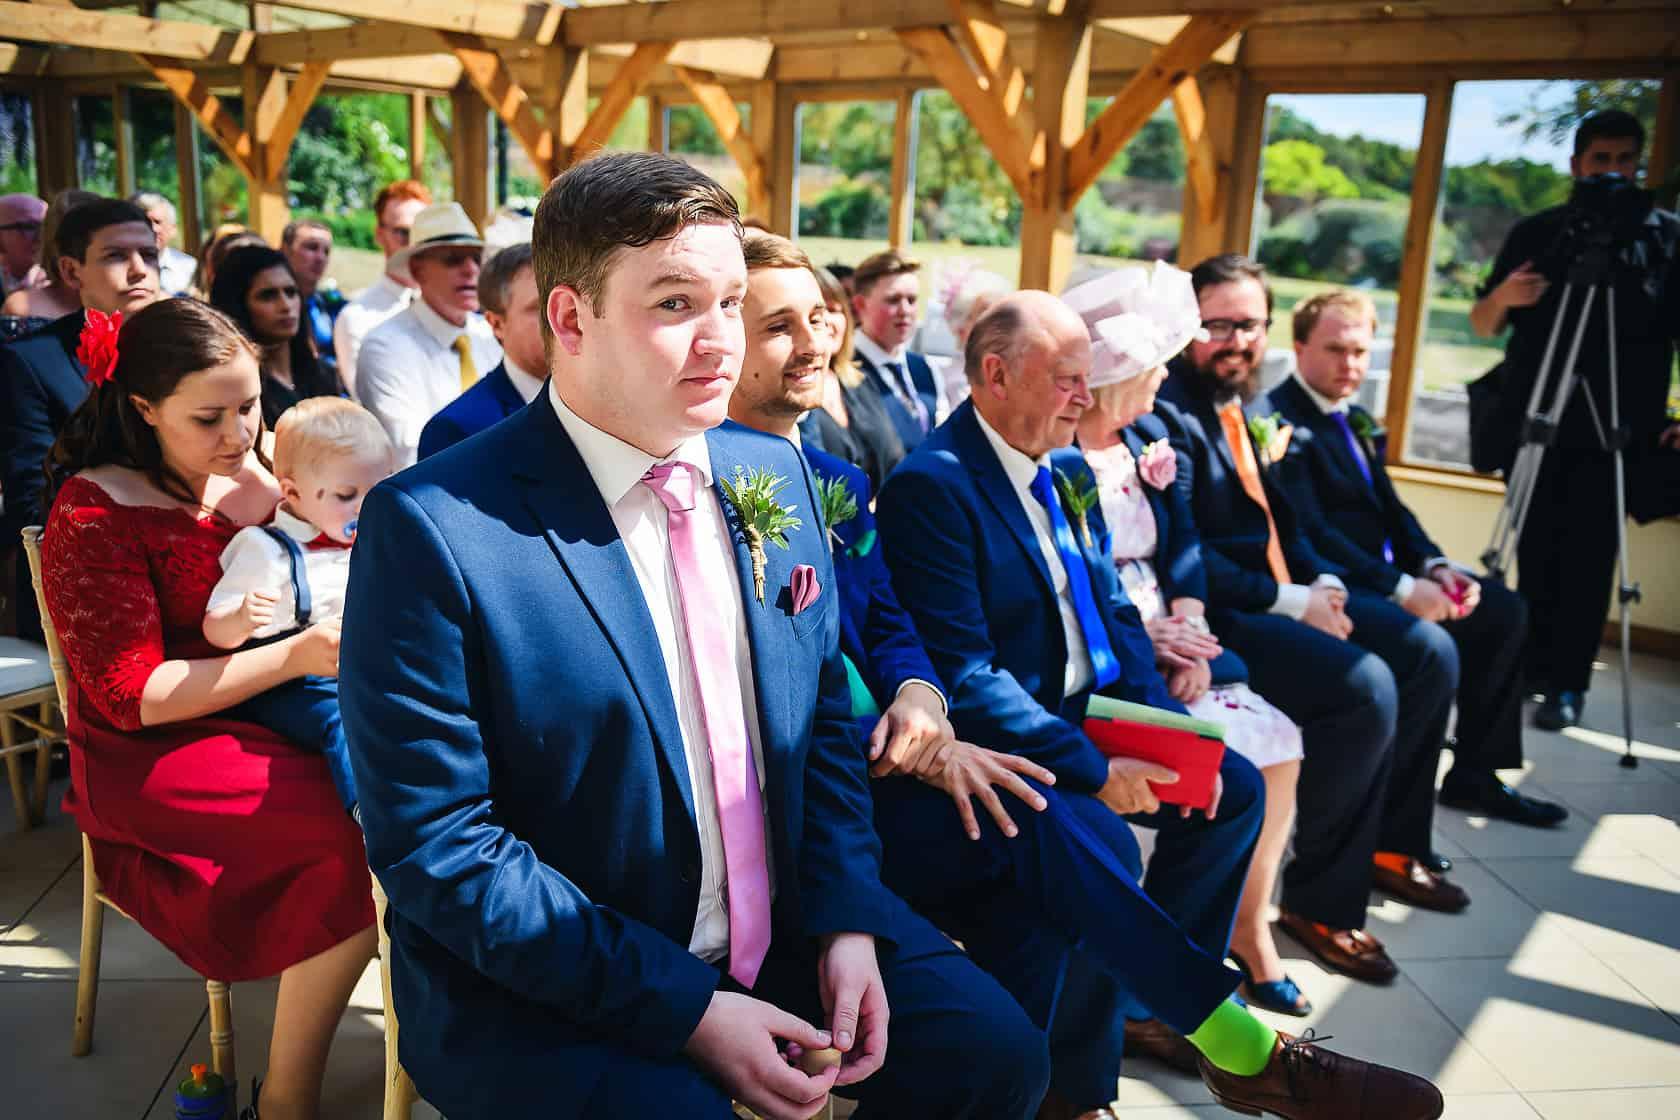 Best_Wedding_Photography_2018_Wedding-Photographer-Essex-and-London_016